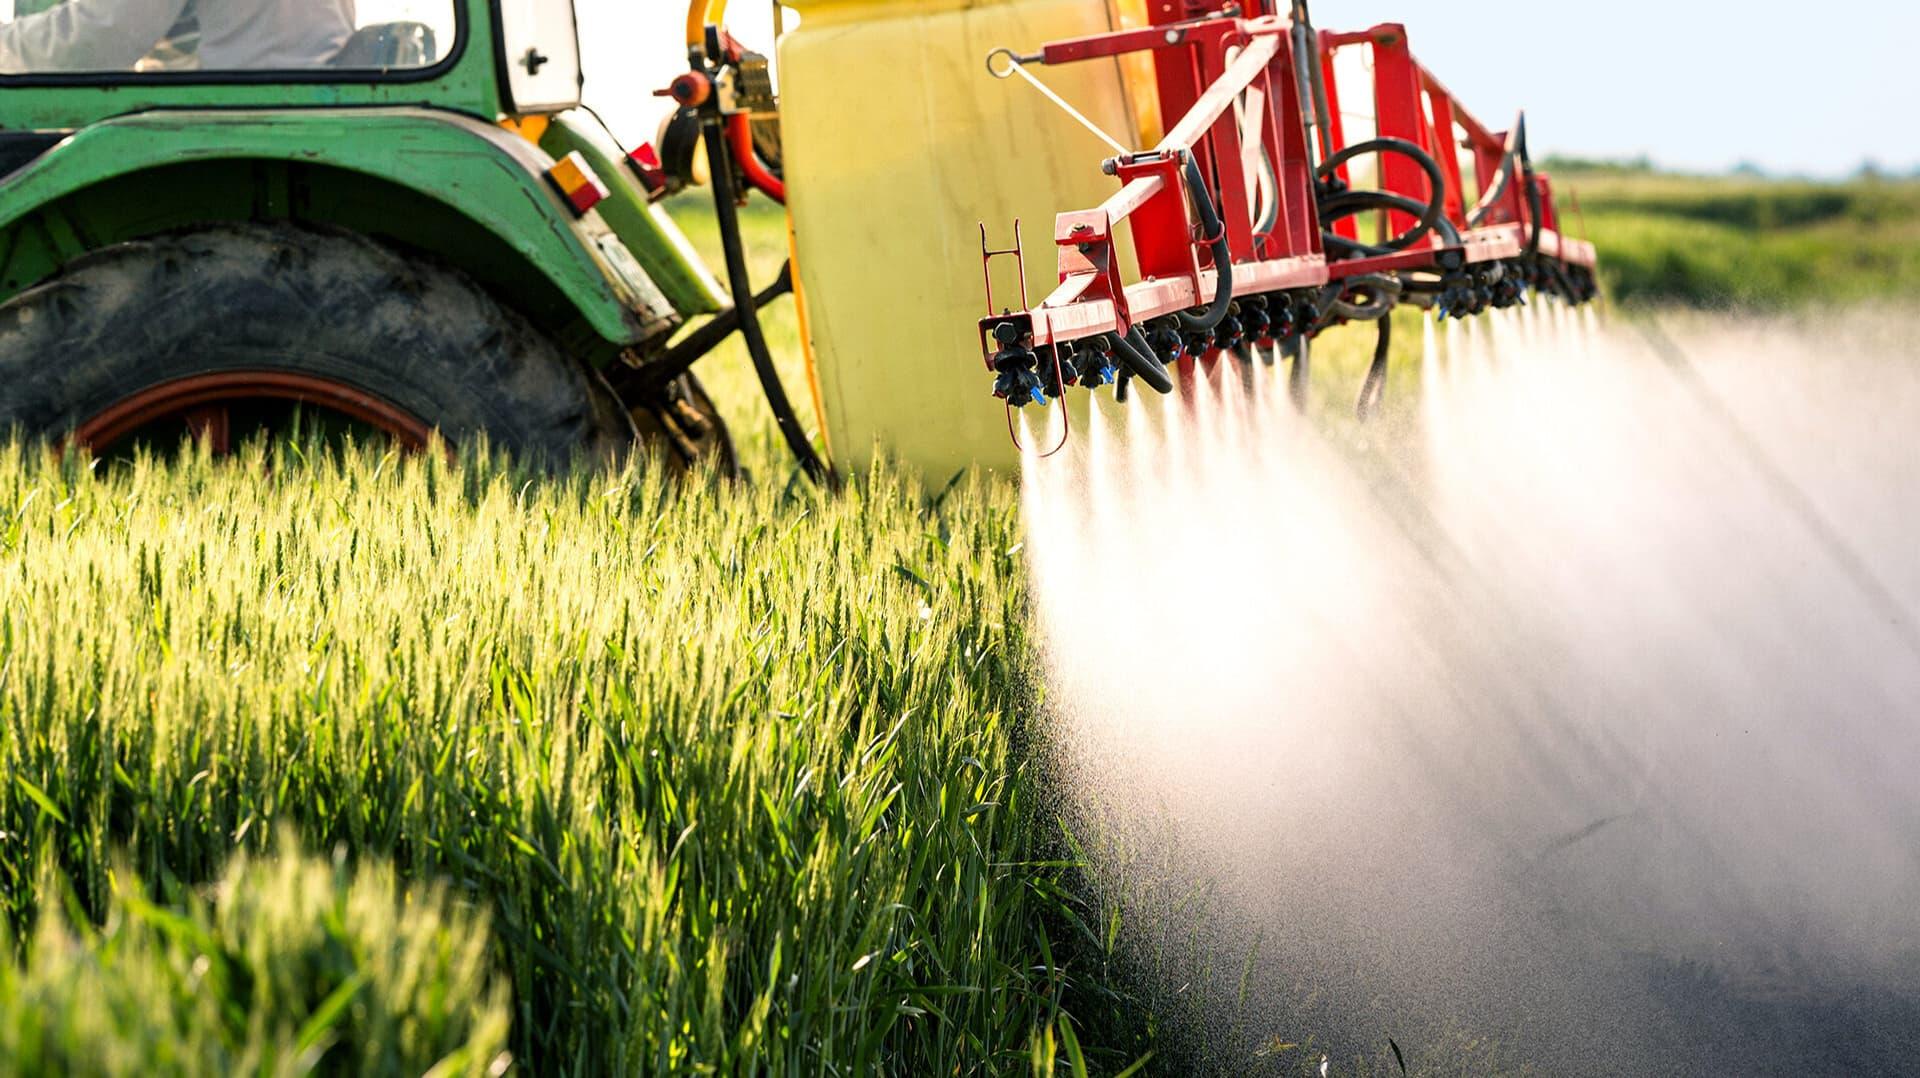 Traktor verspritzt Pestizide